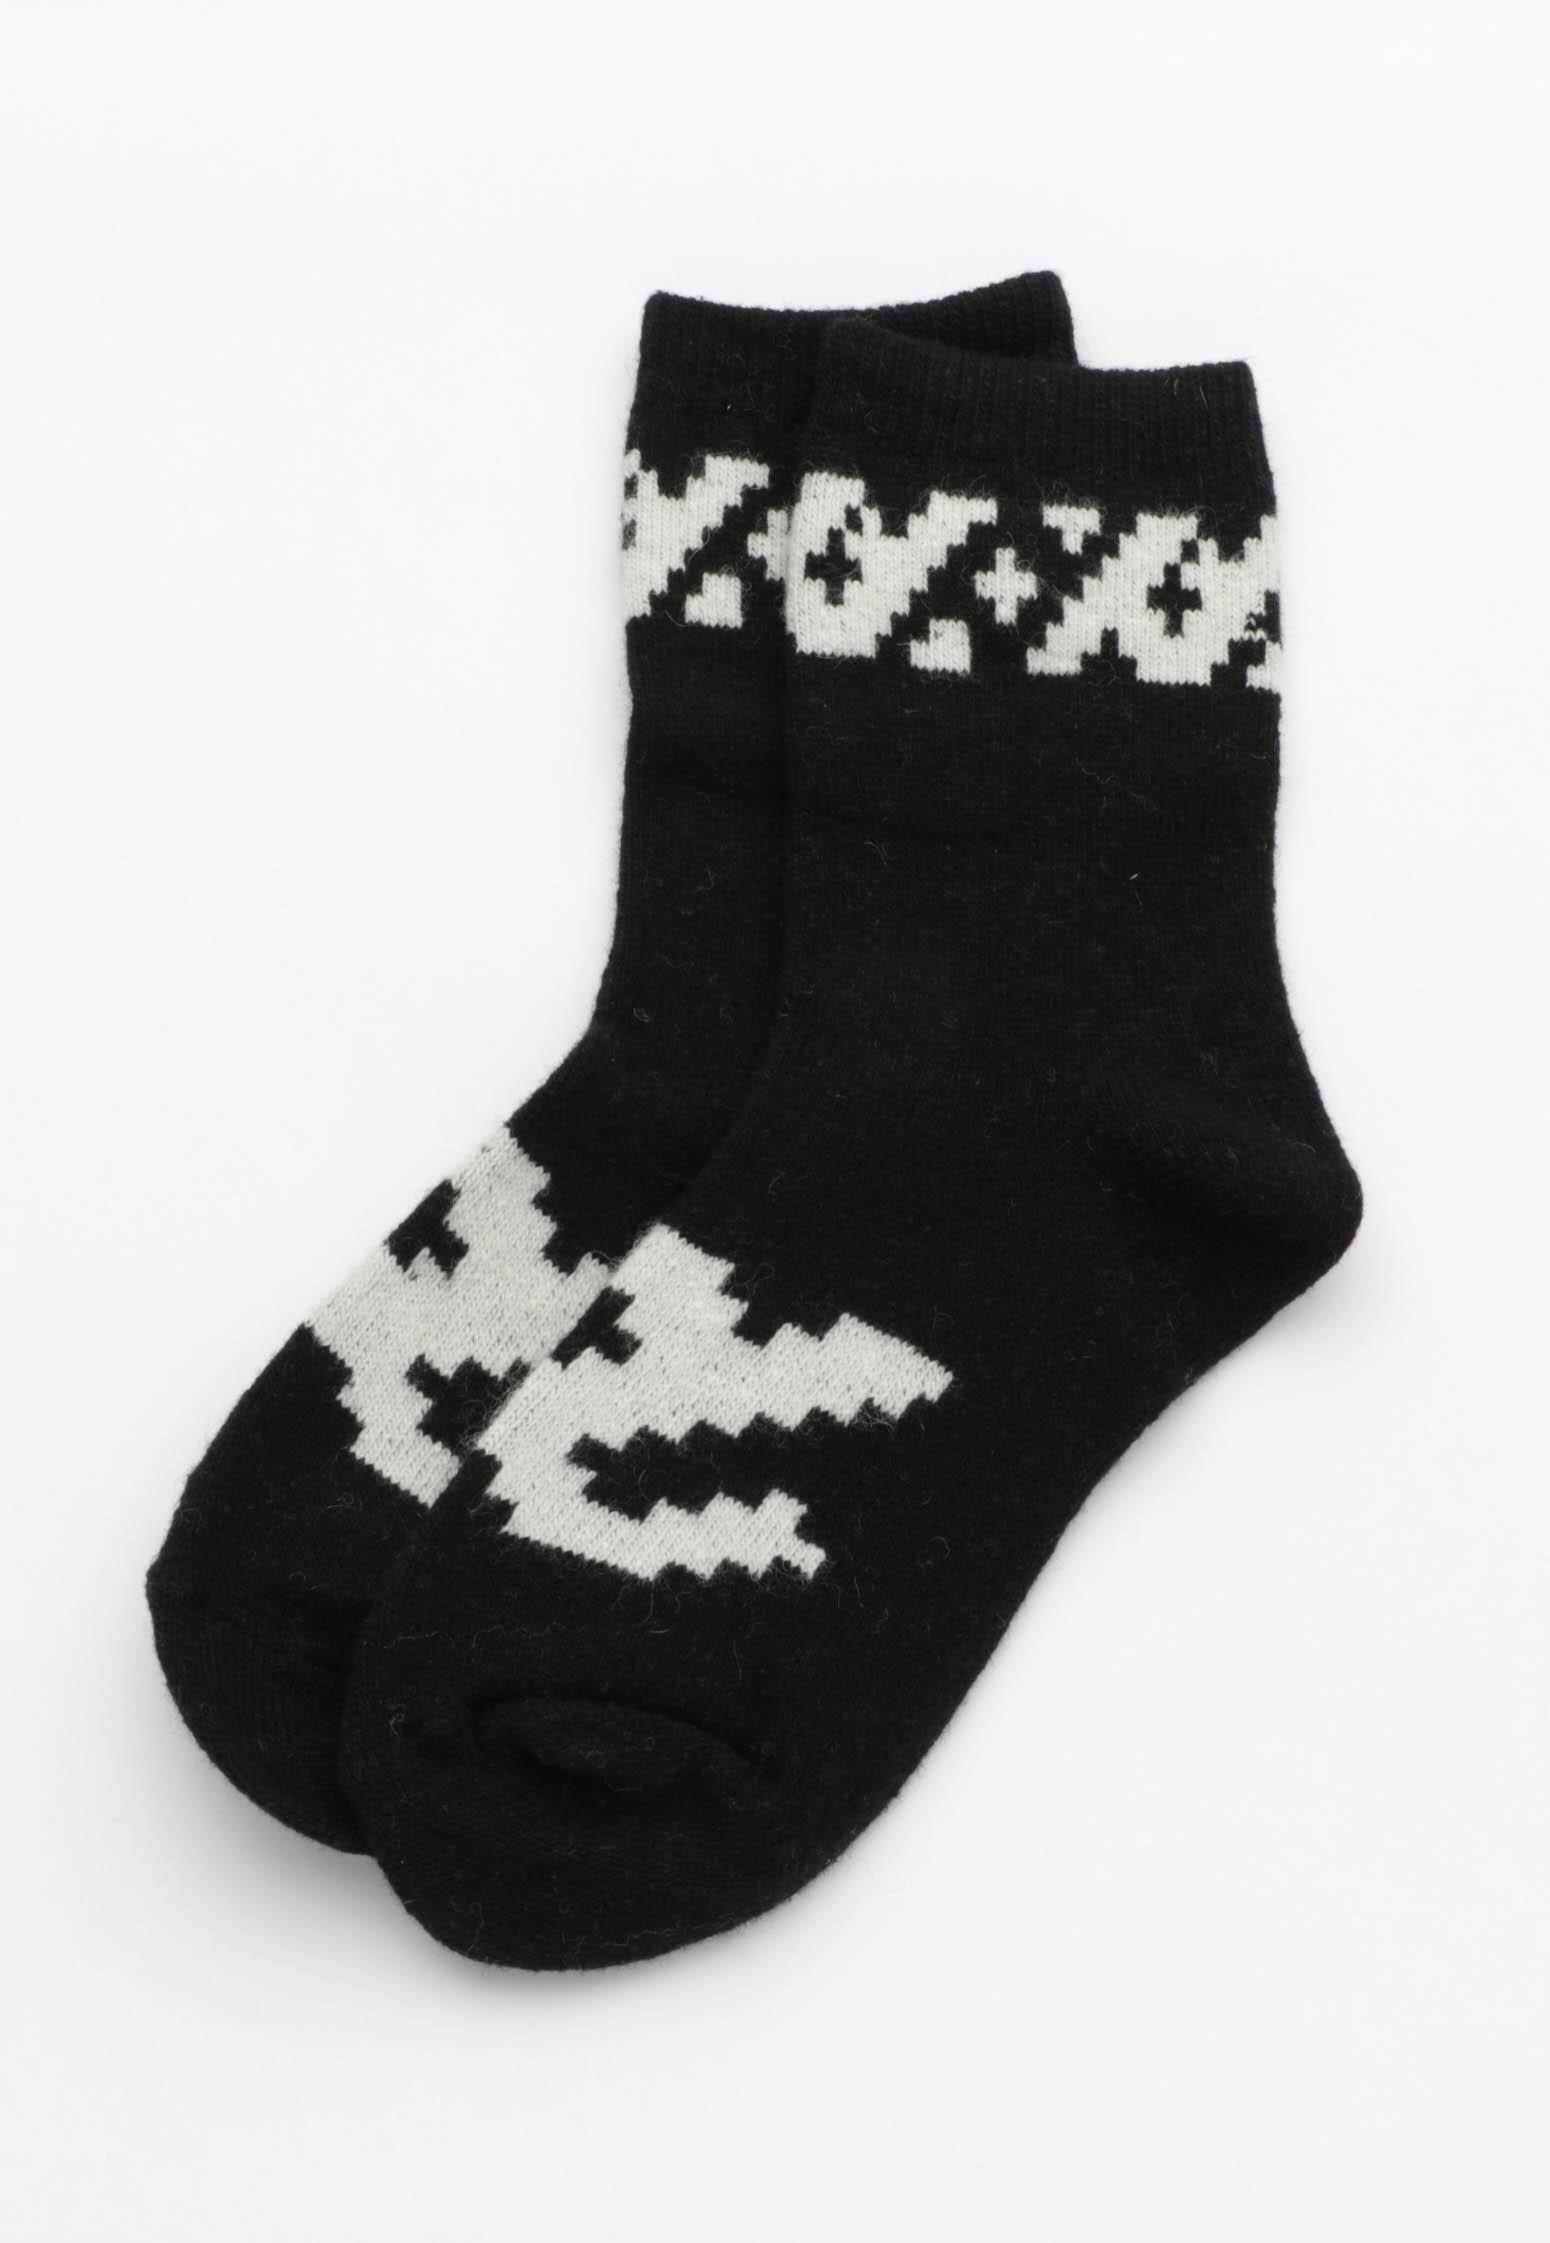 Print Socks - Black